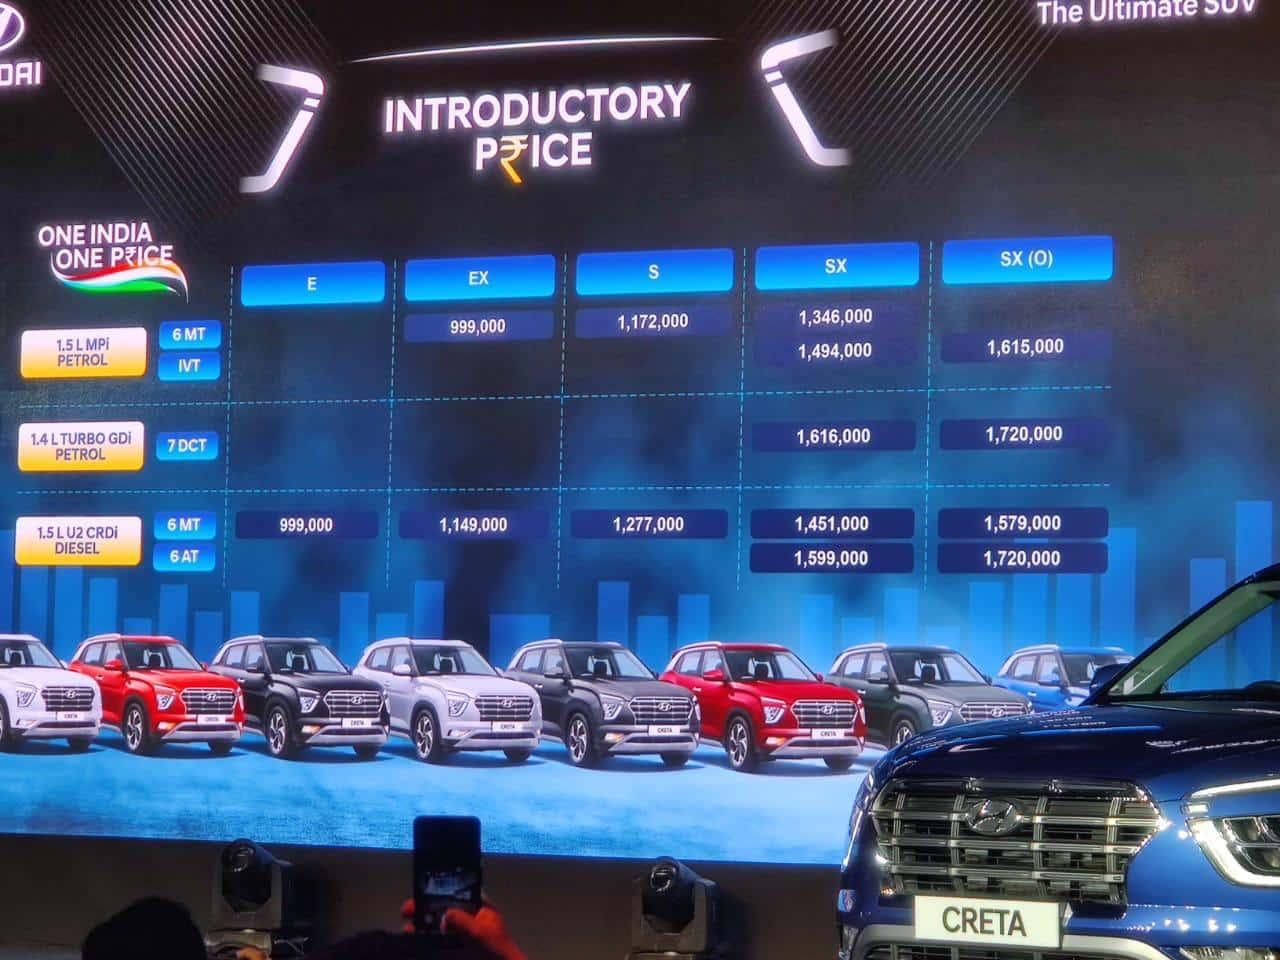 2020 Hyundai Creta Prices